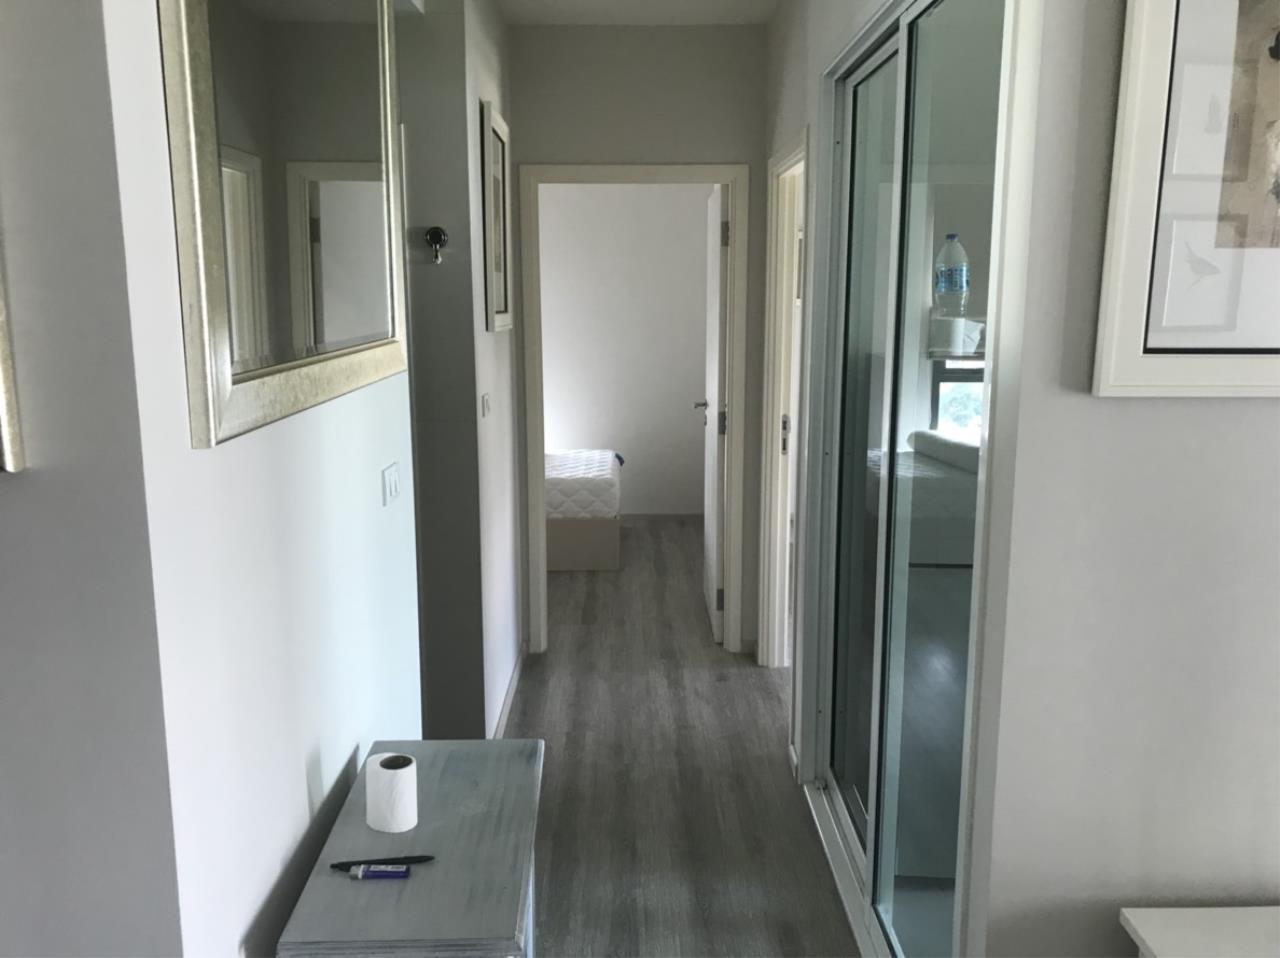 Quality Life Property Agency's S A L E  ! Centric Ari Station | 2 BED 1 BATH | 50.19 SQ. M. 7